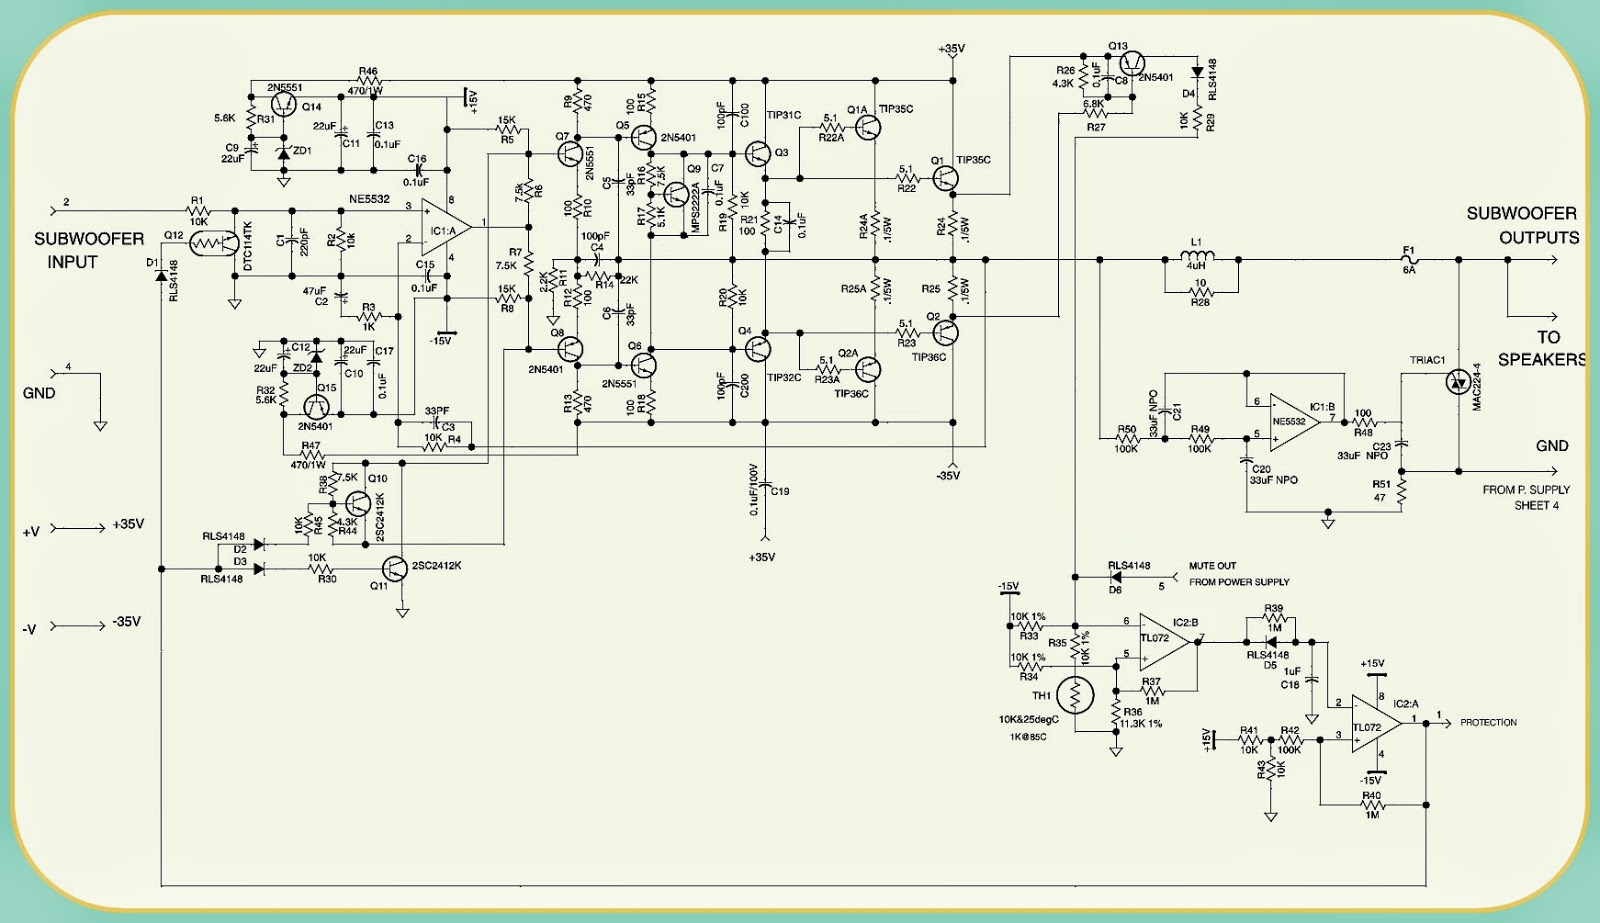 medium resolution of bass 550 jbl powered subwoofer schematic circuit diagram jbl powered subwoofer bass550 circuit diagram exploded view power